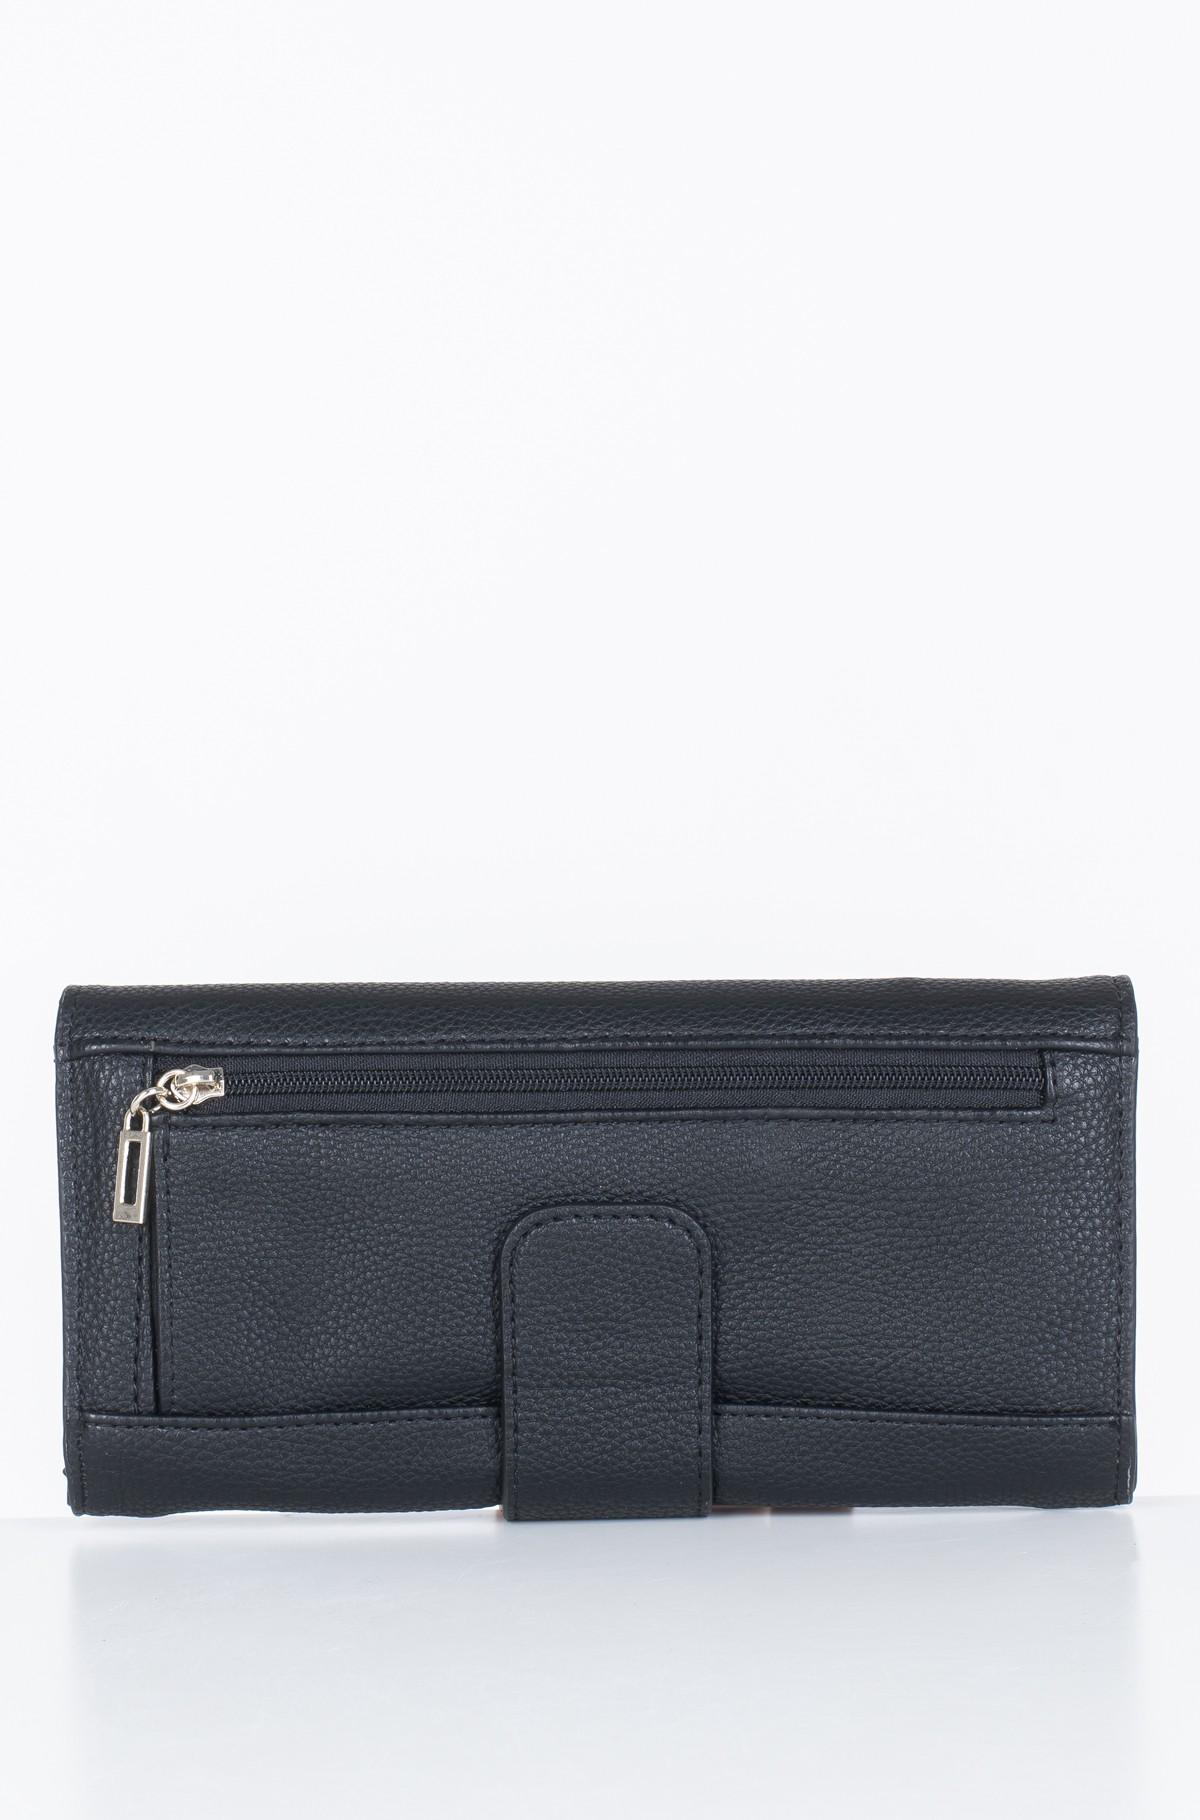 Wallet SWVG75 83590-full-2